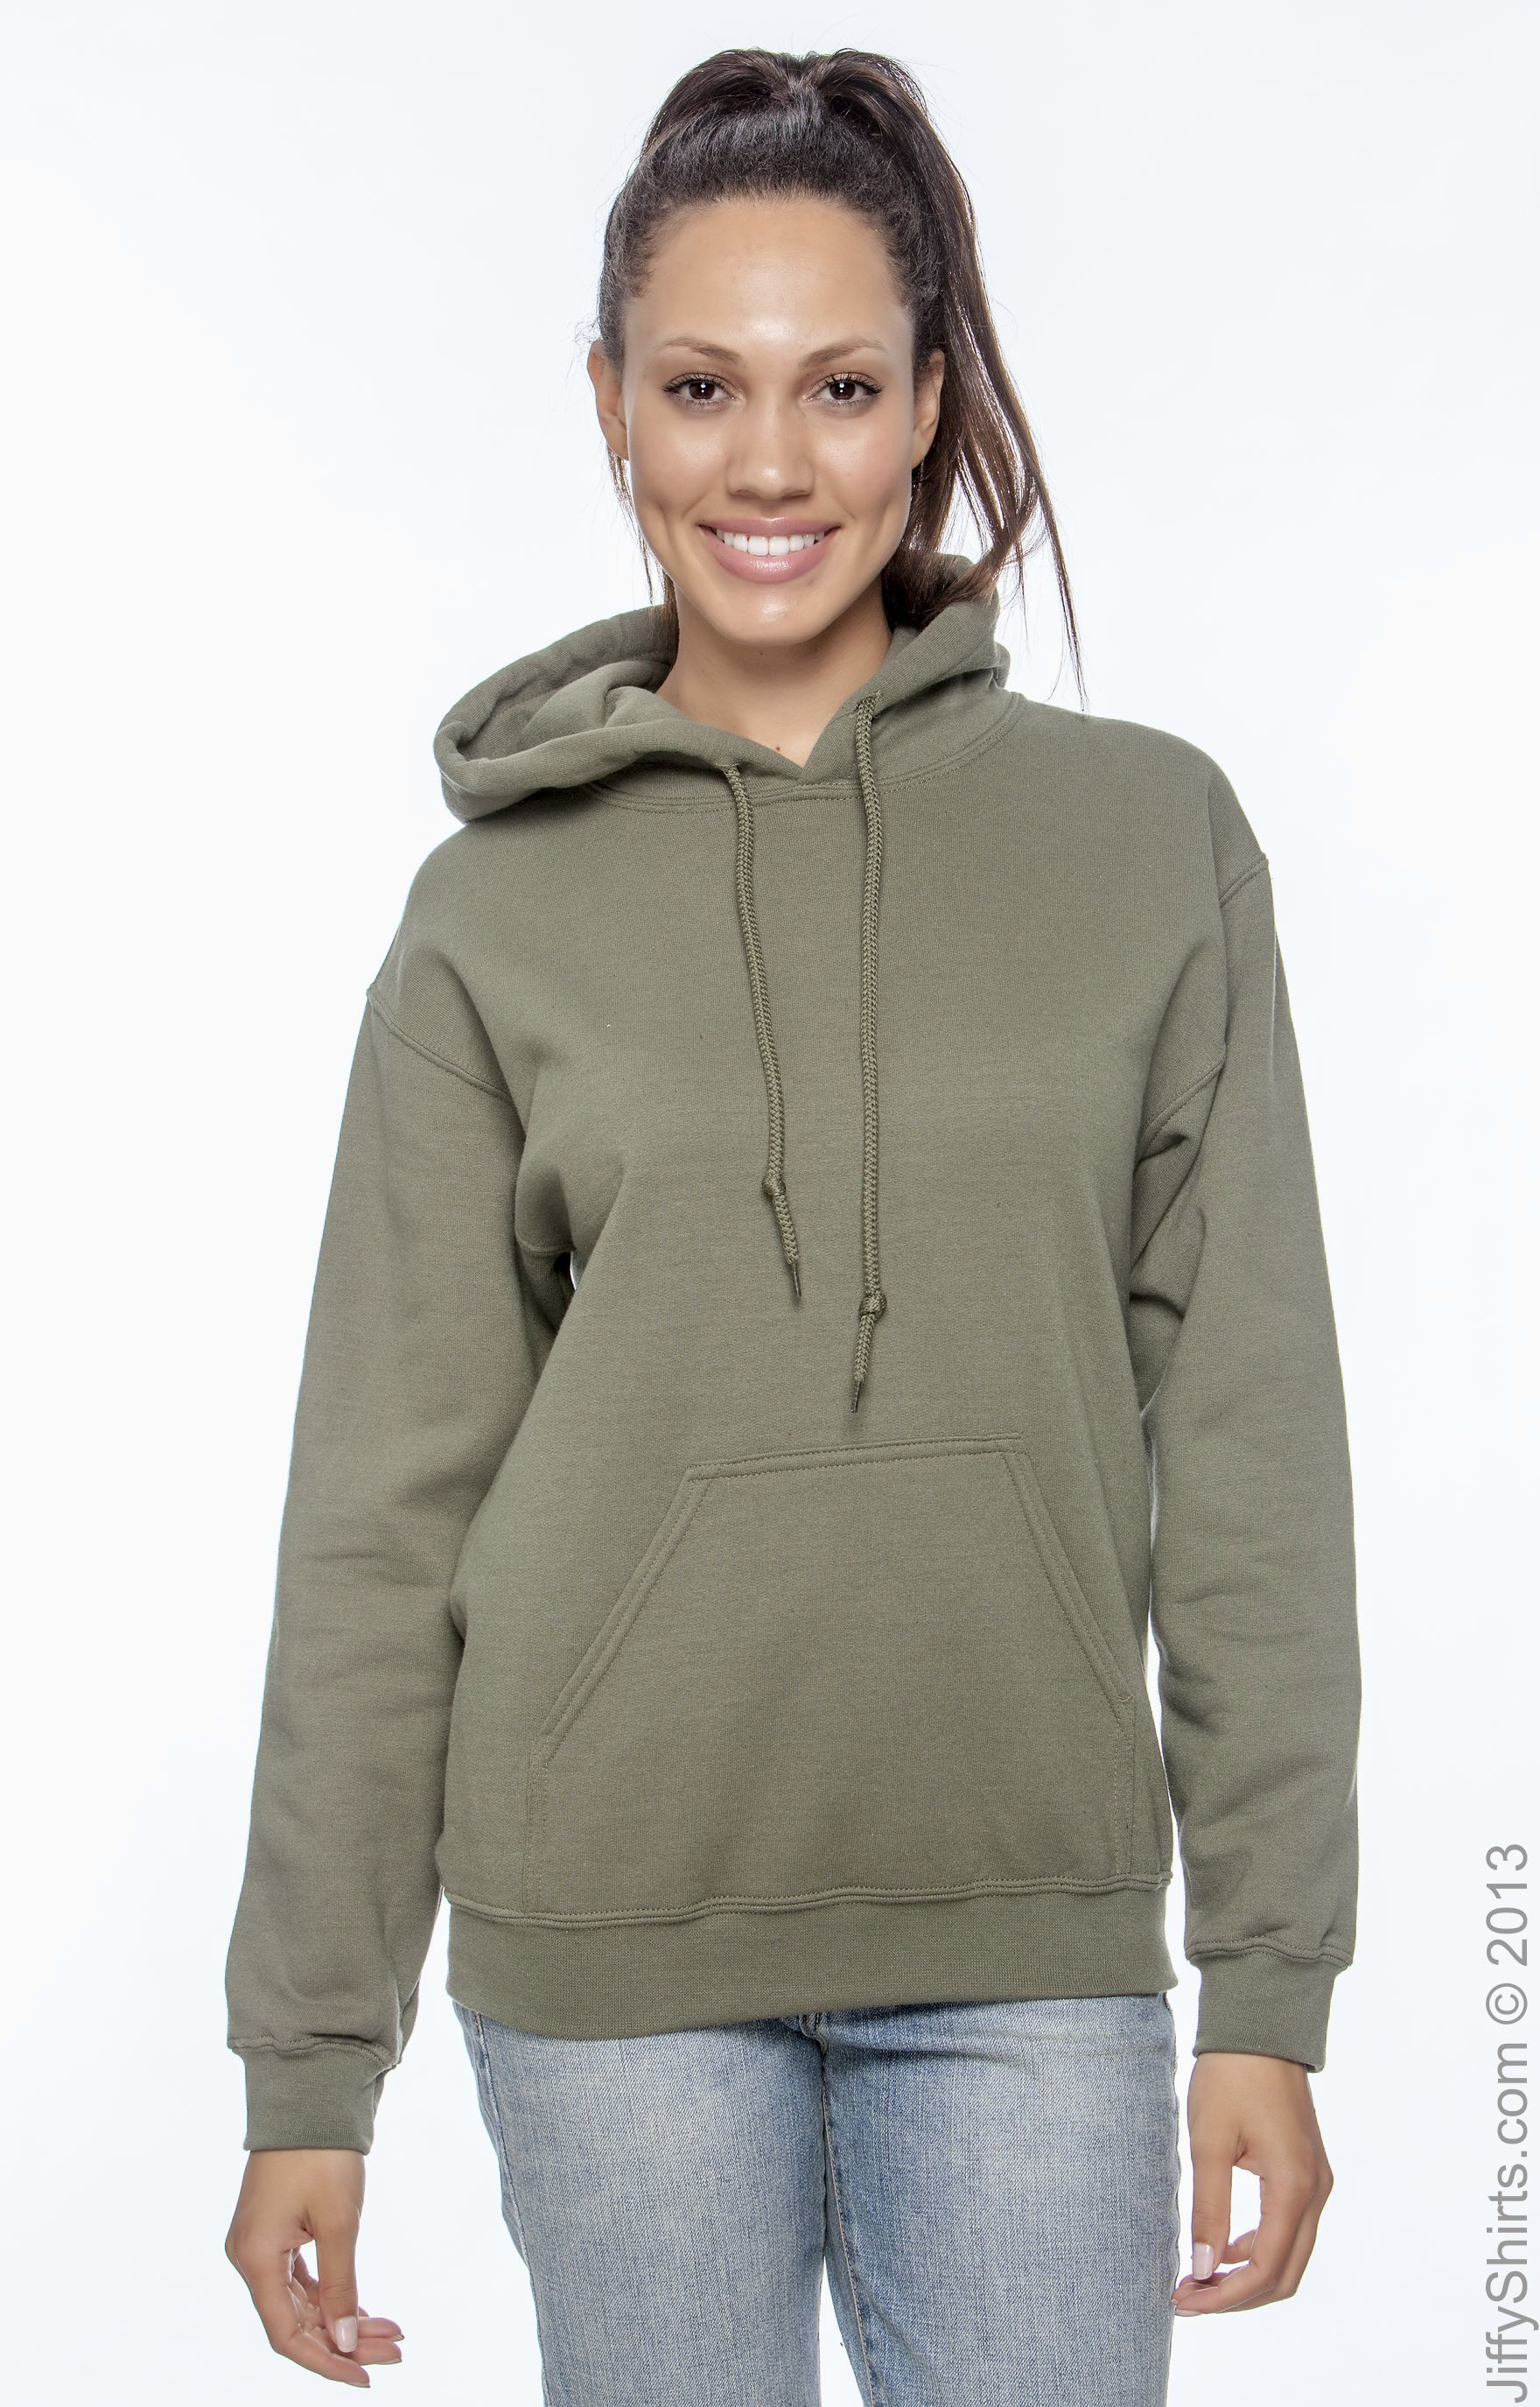 50/% ORGANIC COTTON  Pullover Hooded SWEATSHIRT Green Anvil 8 oz